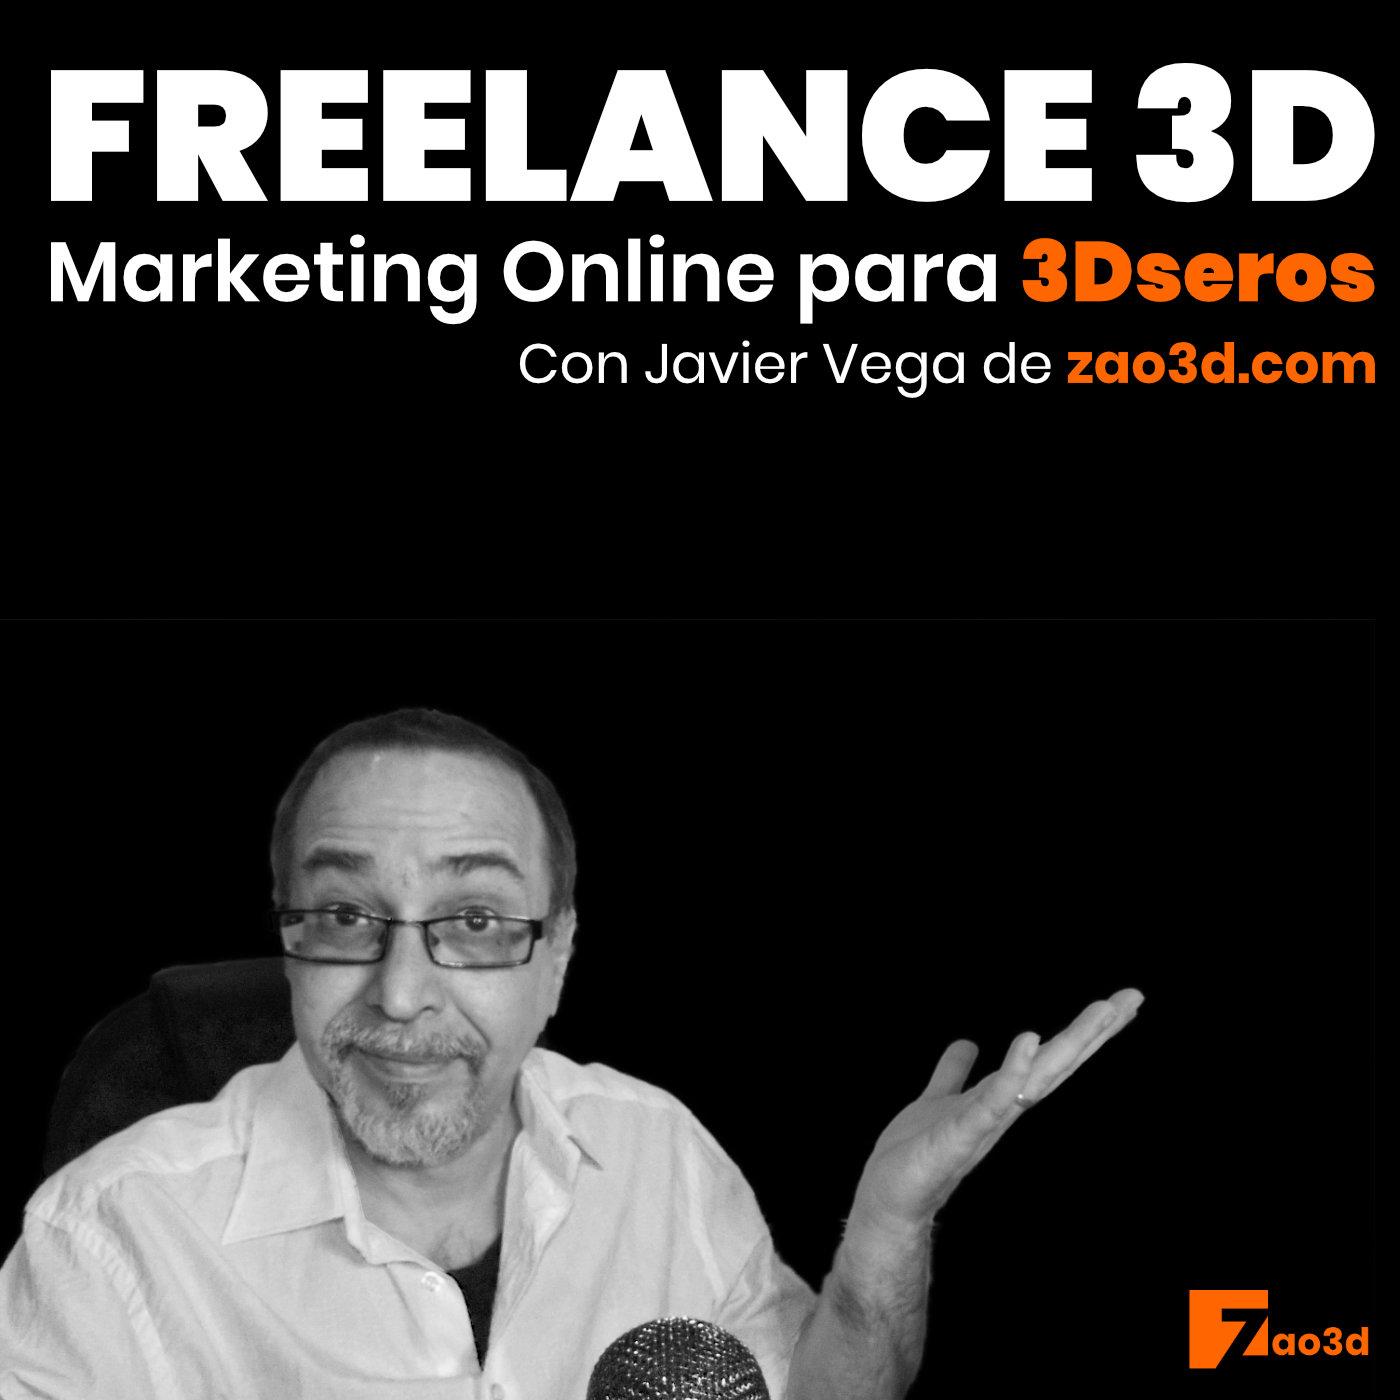 Podcast Freelance 3D